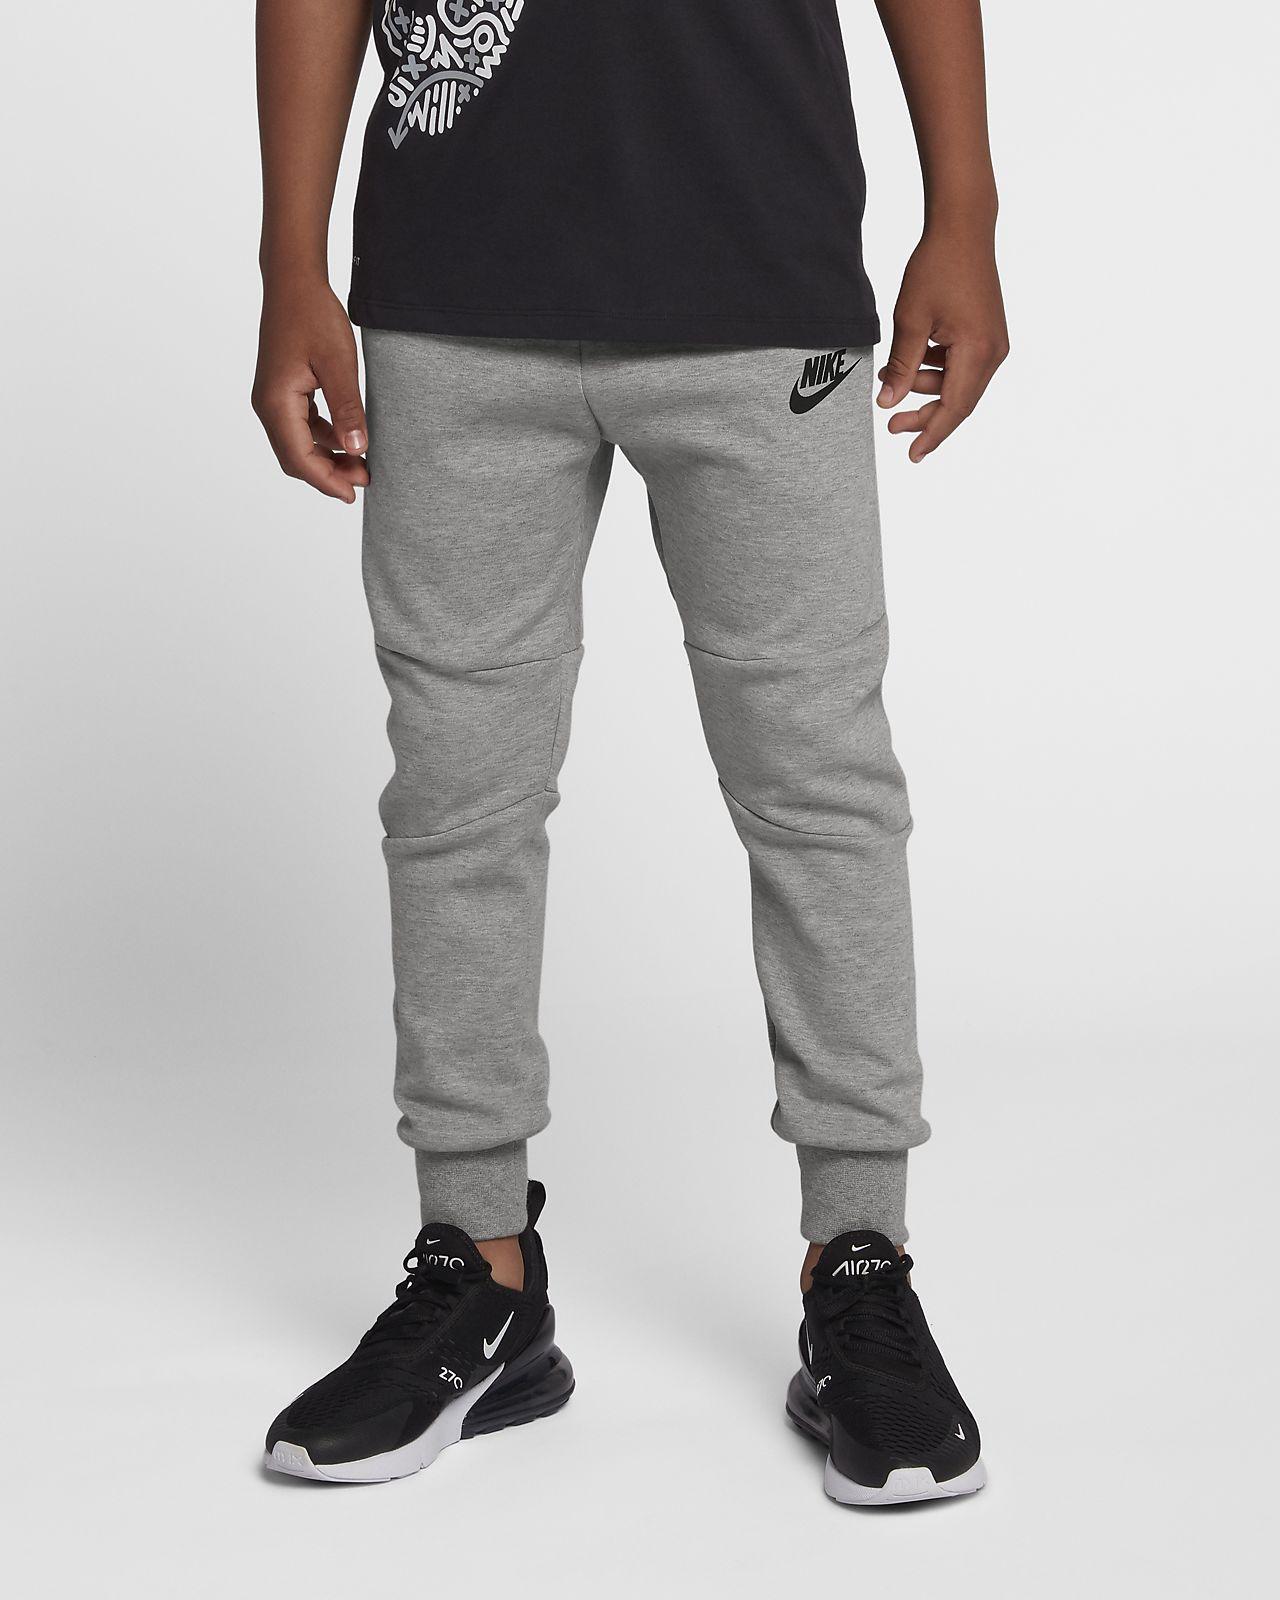 hot sale online 9dd8a d35ac ... Pantalon en tissu Tech Fleece Nike Sportswear pour Enfant plus âgé